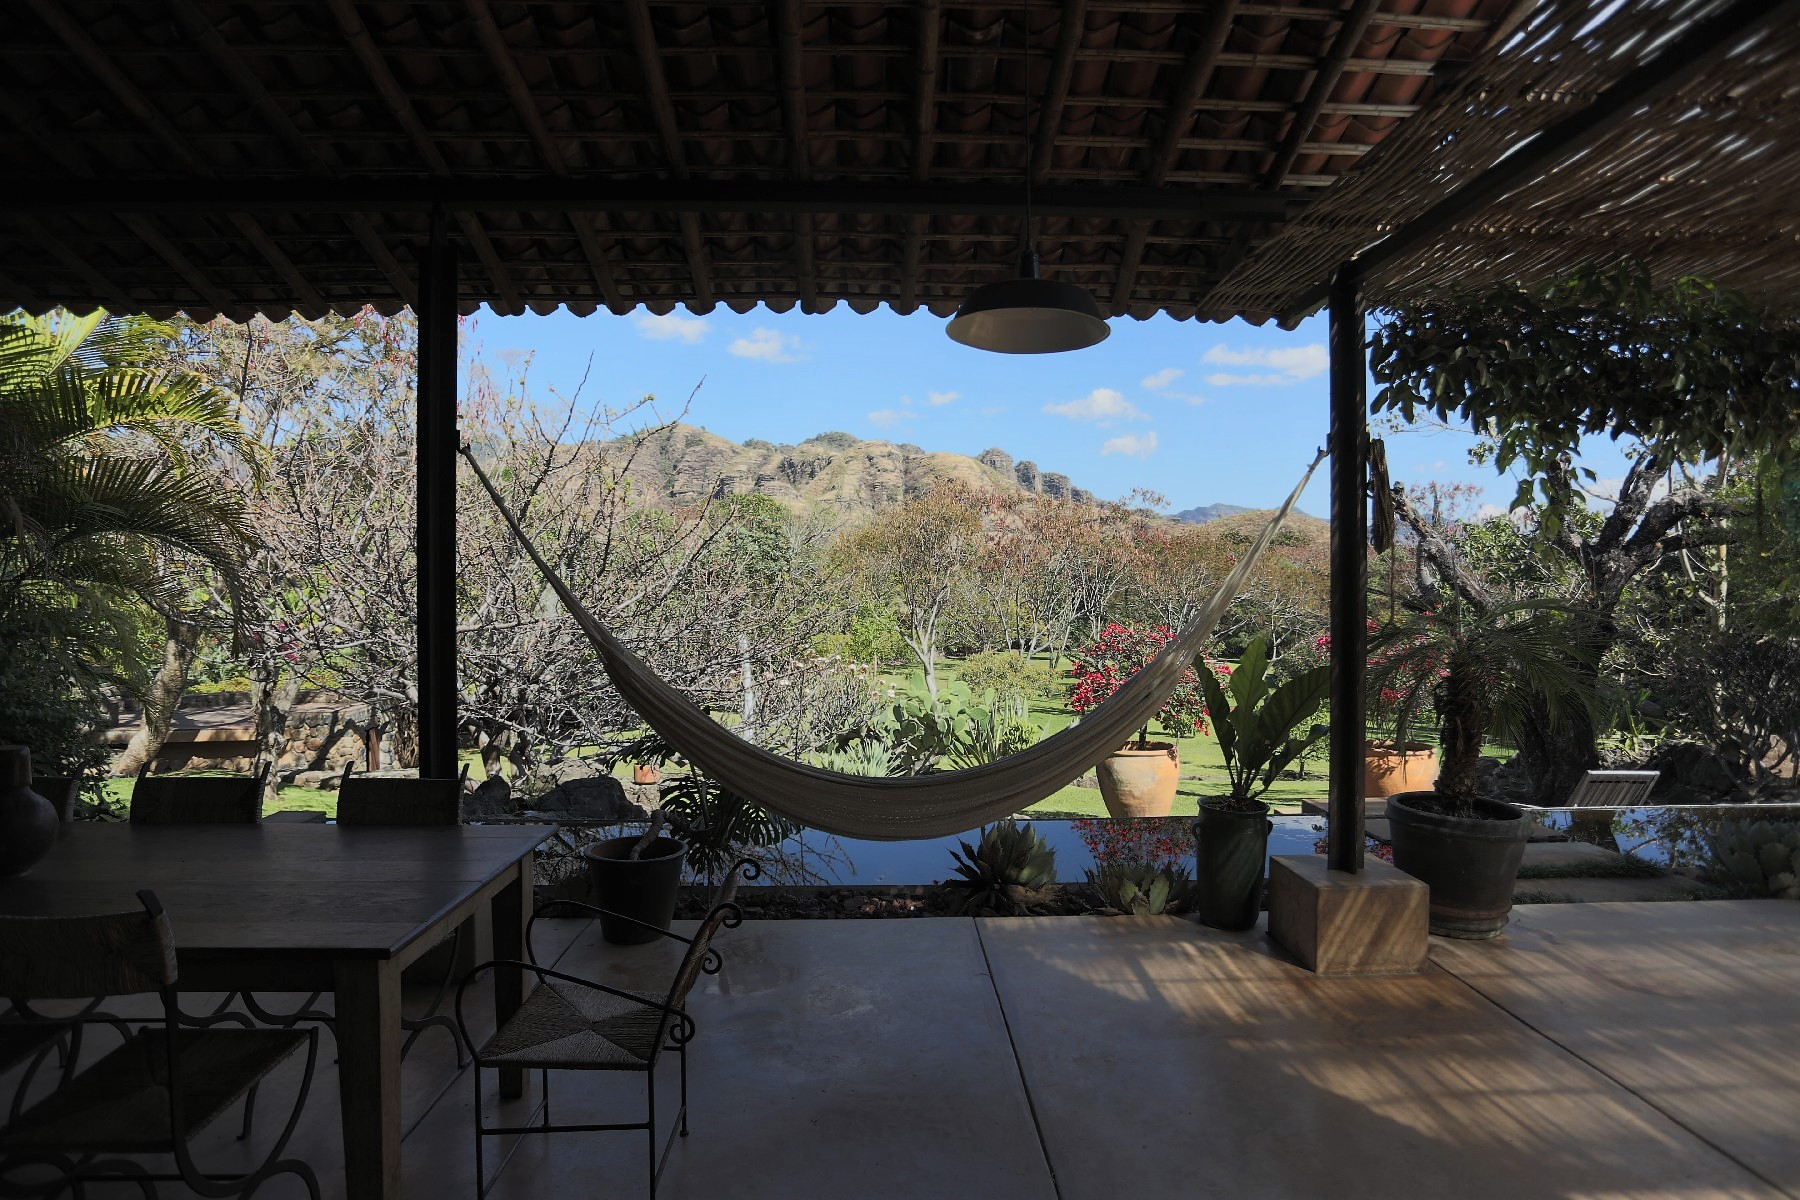 Additional photo for property listing at Hacienda Agua del Prior, Malinalco, Estado de Mexico, CDMX Agua del Prior Malinalco Federal District, Mexico Df 52440 Mexico